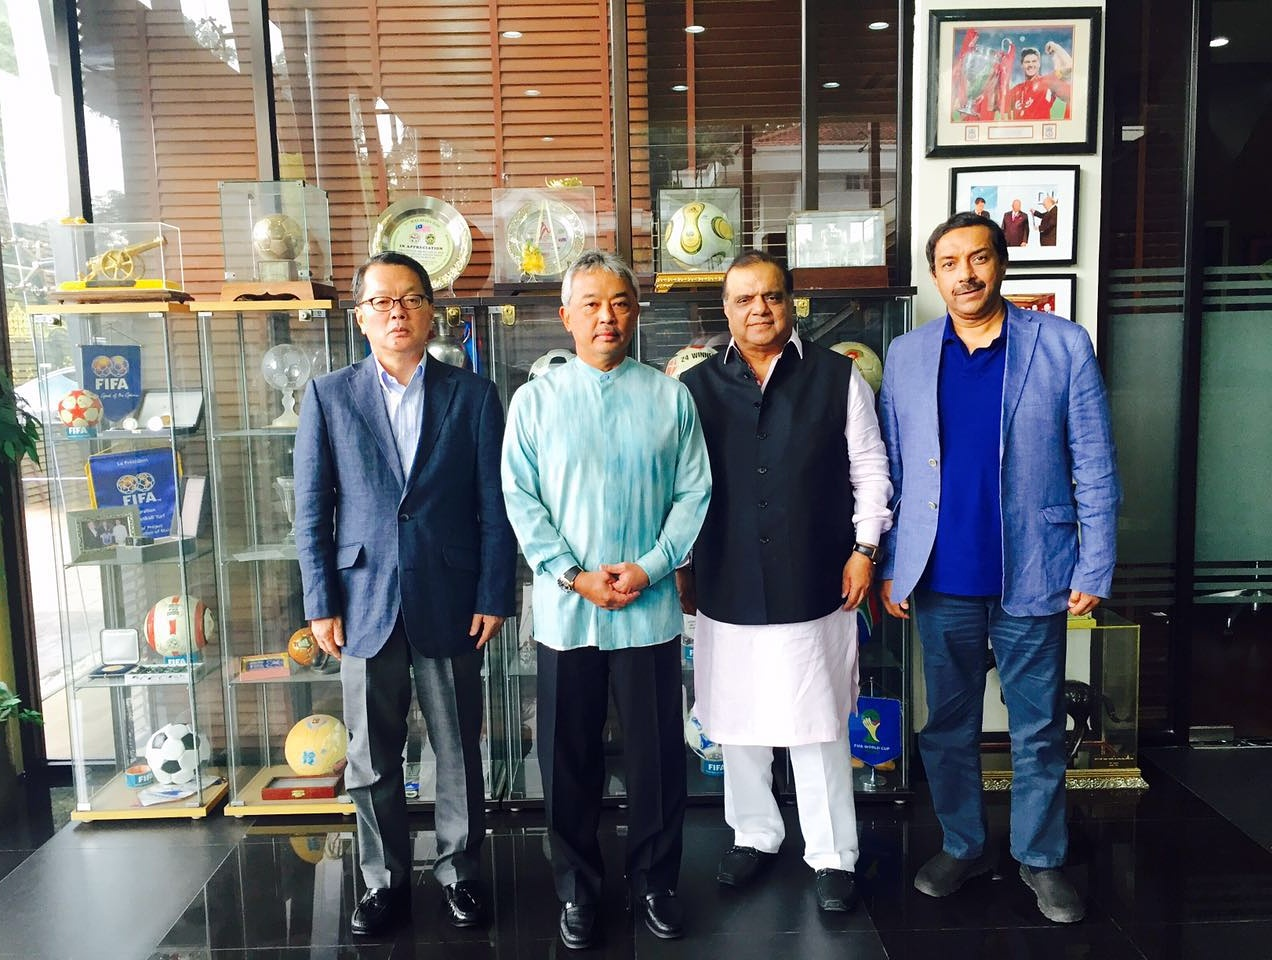 Honorary Treasurer Dato' Fumio Ogura, AHF President Tengku Abdullah Ahmad Shah,  Vice President Dr. Narinder Batra, CEO Dato' Tayyab Ikram